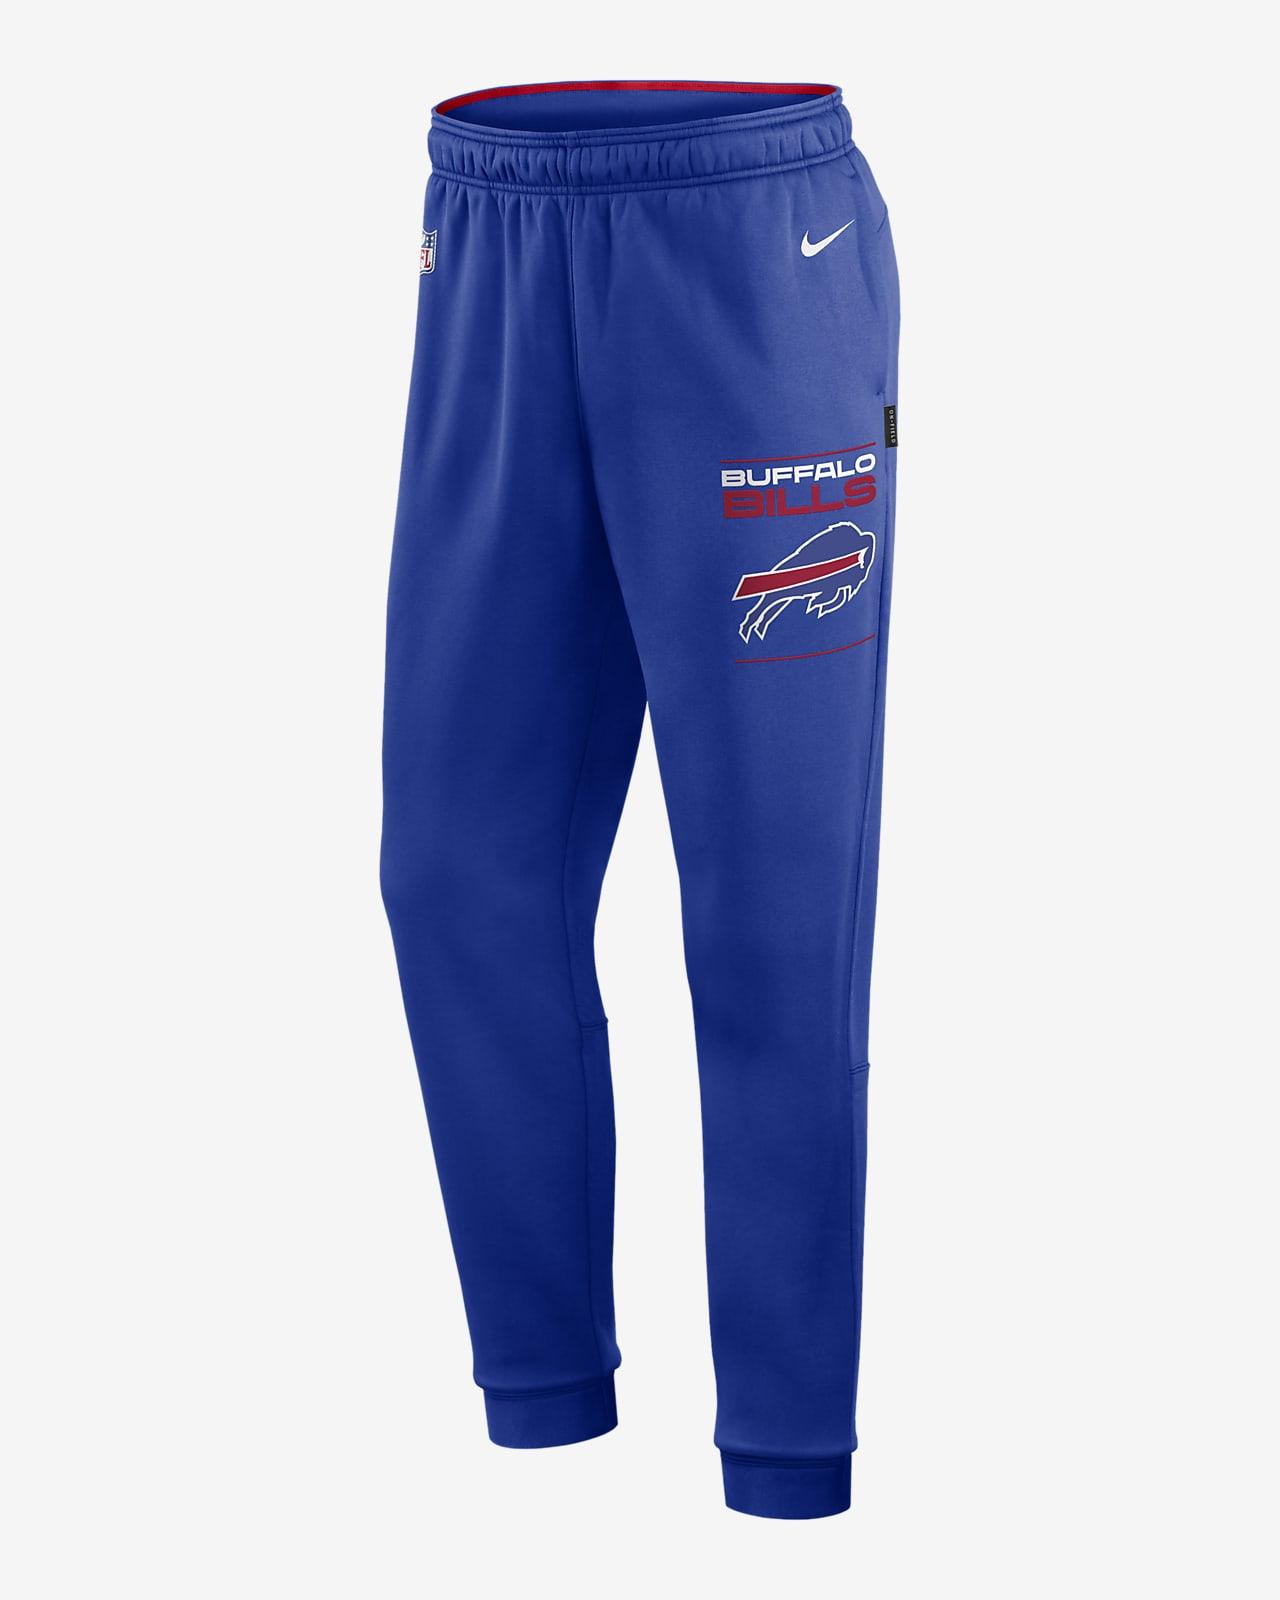 Pants para hombre Nike Therma Sideline (NFL Buffalo Bills)